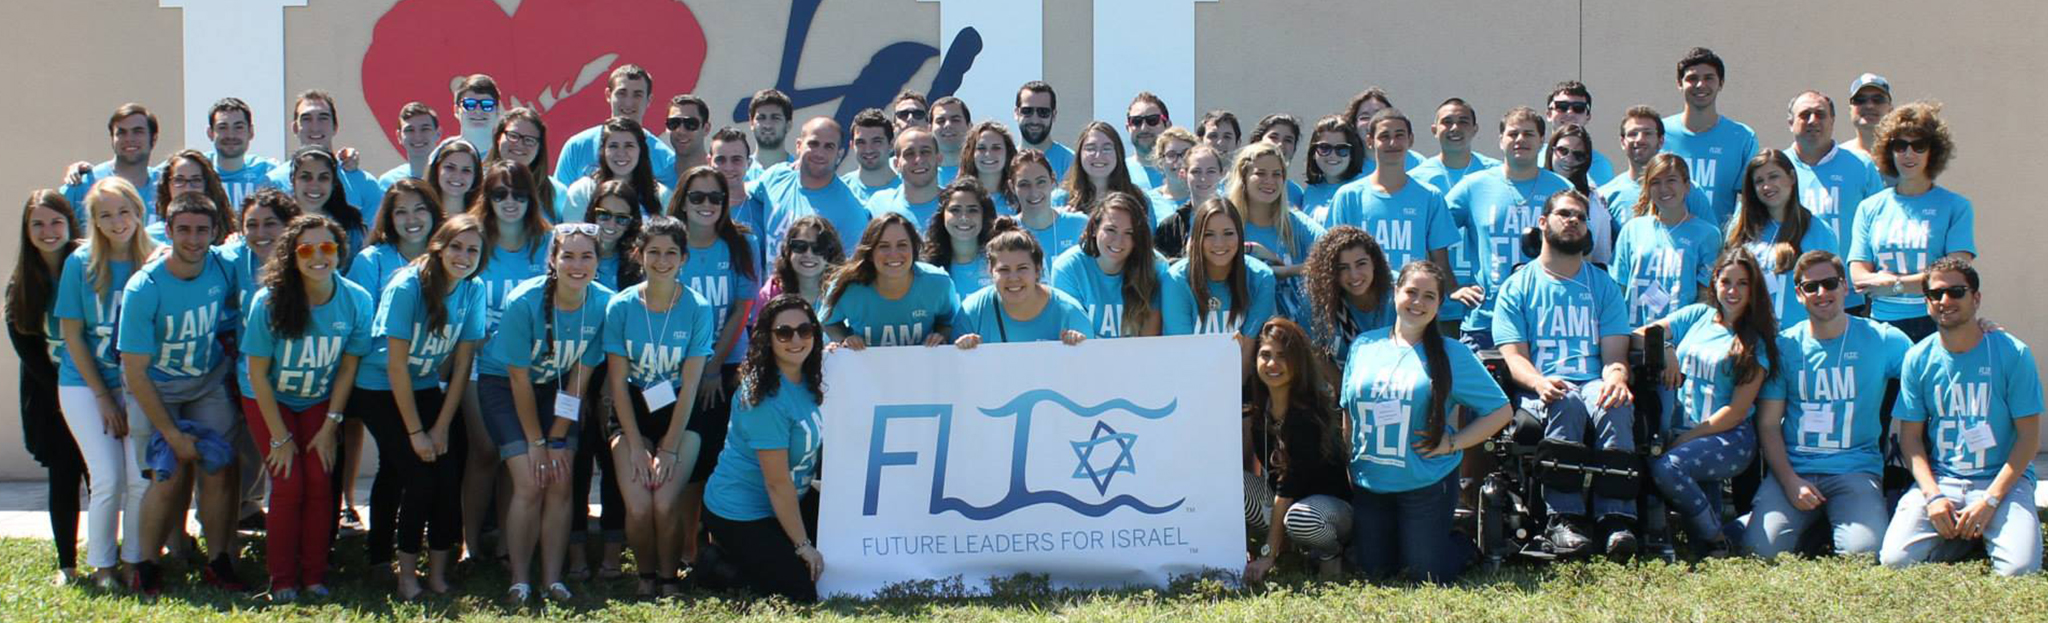 FLI-fau-group-